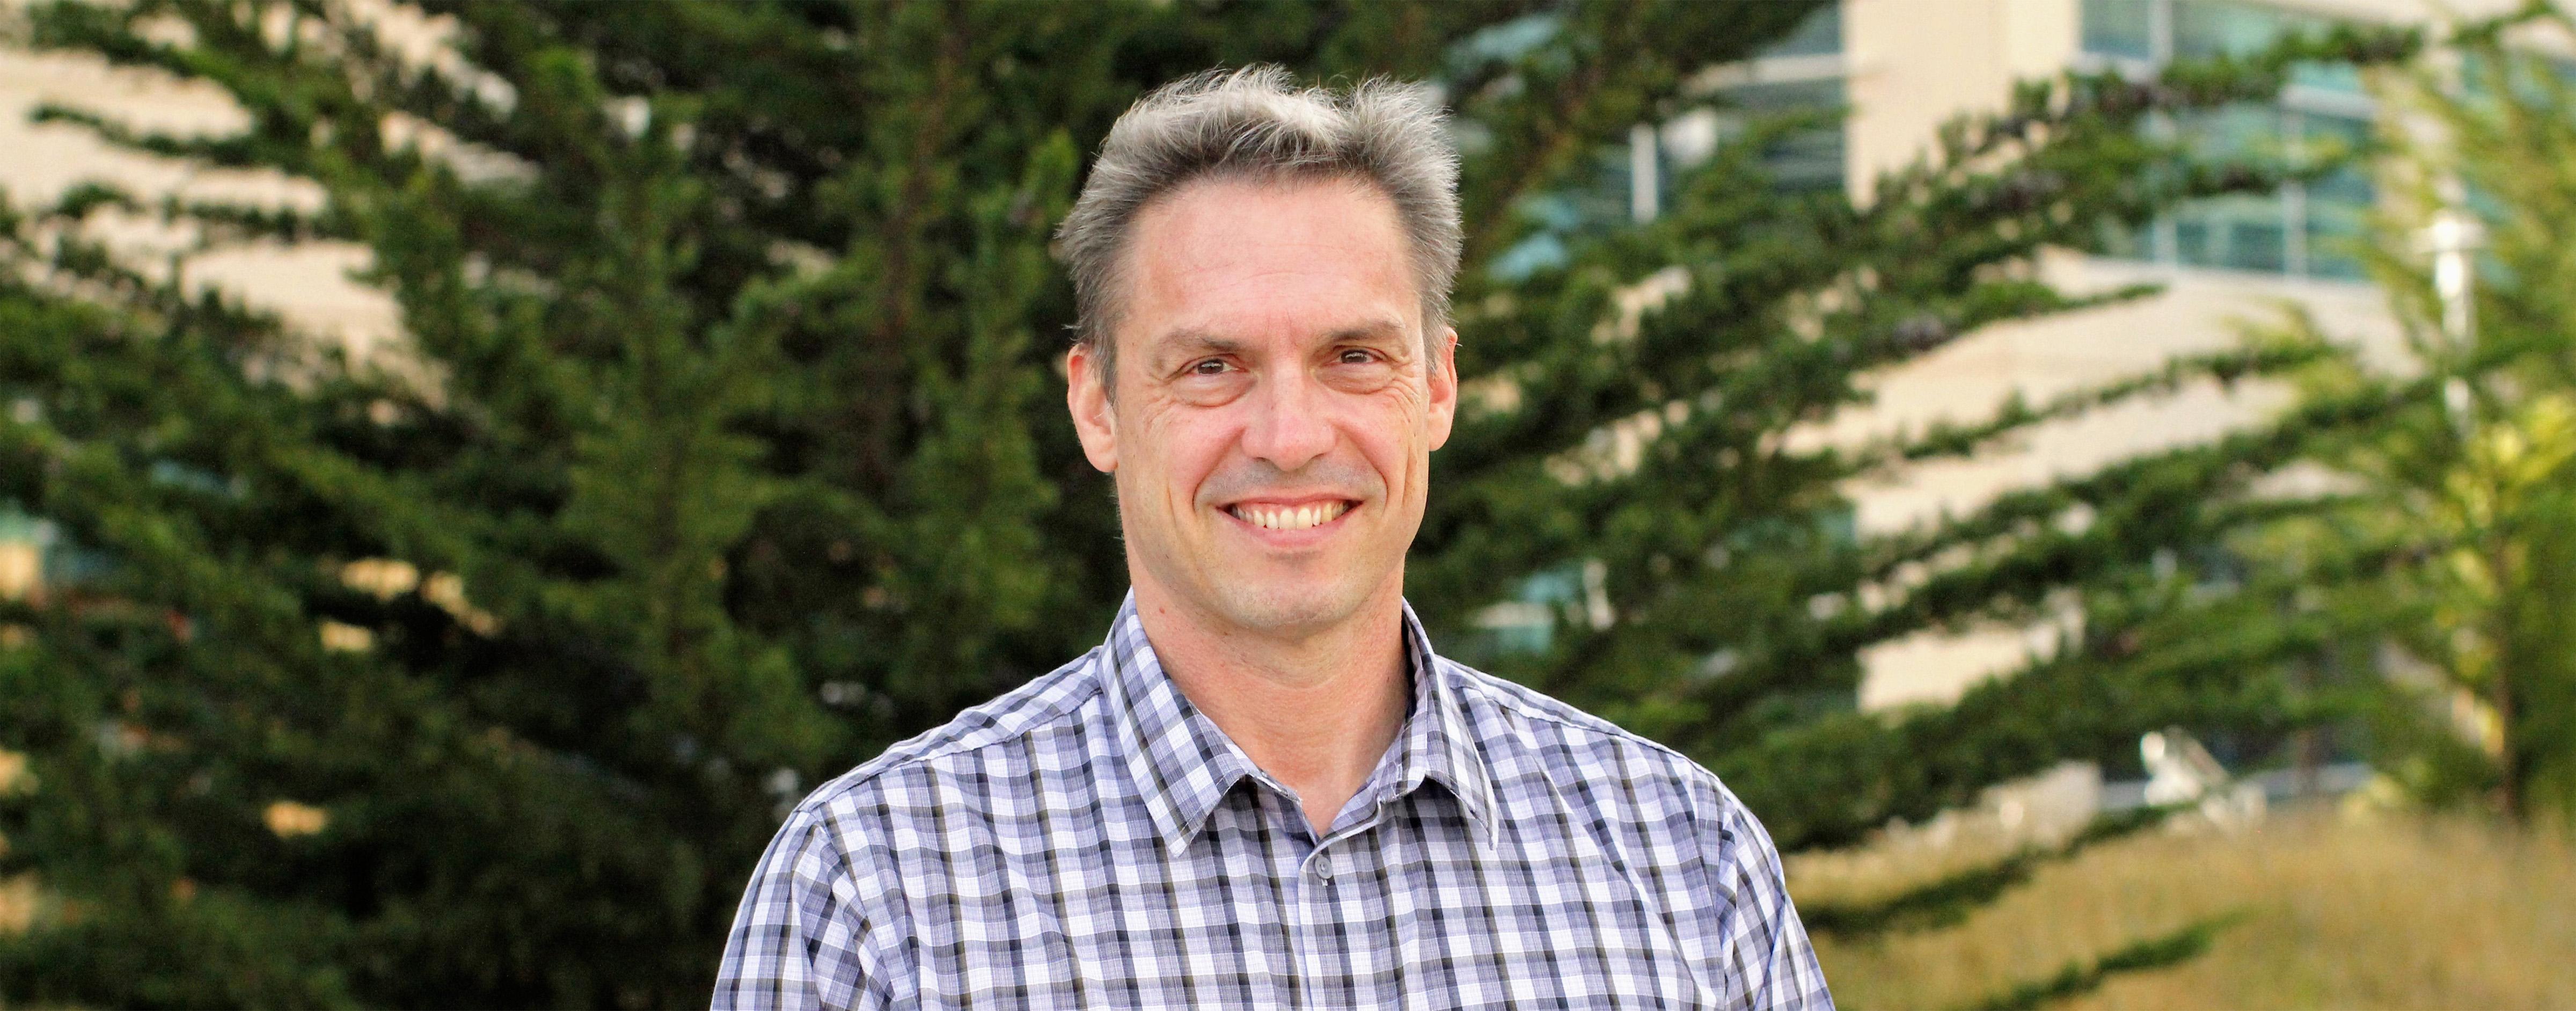 Nico Ghilardi, PhD